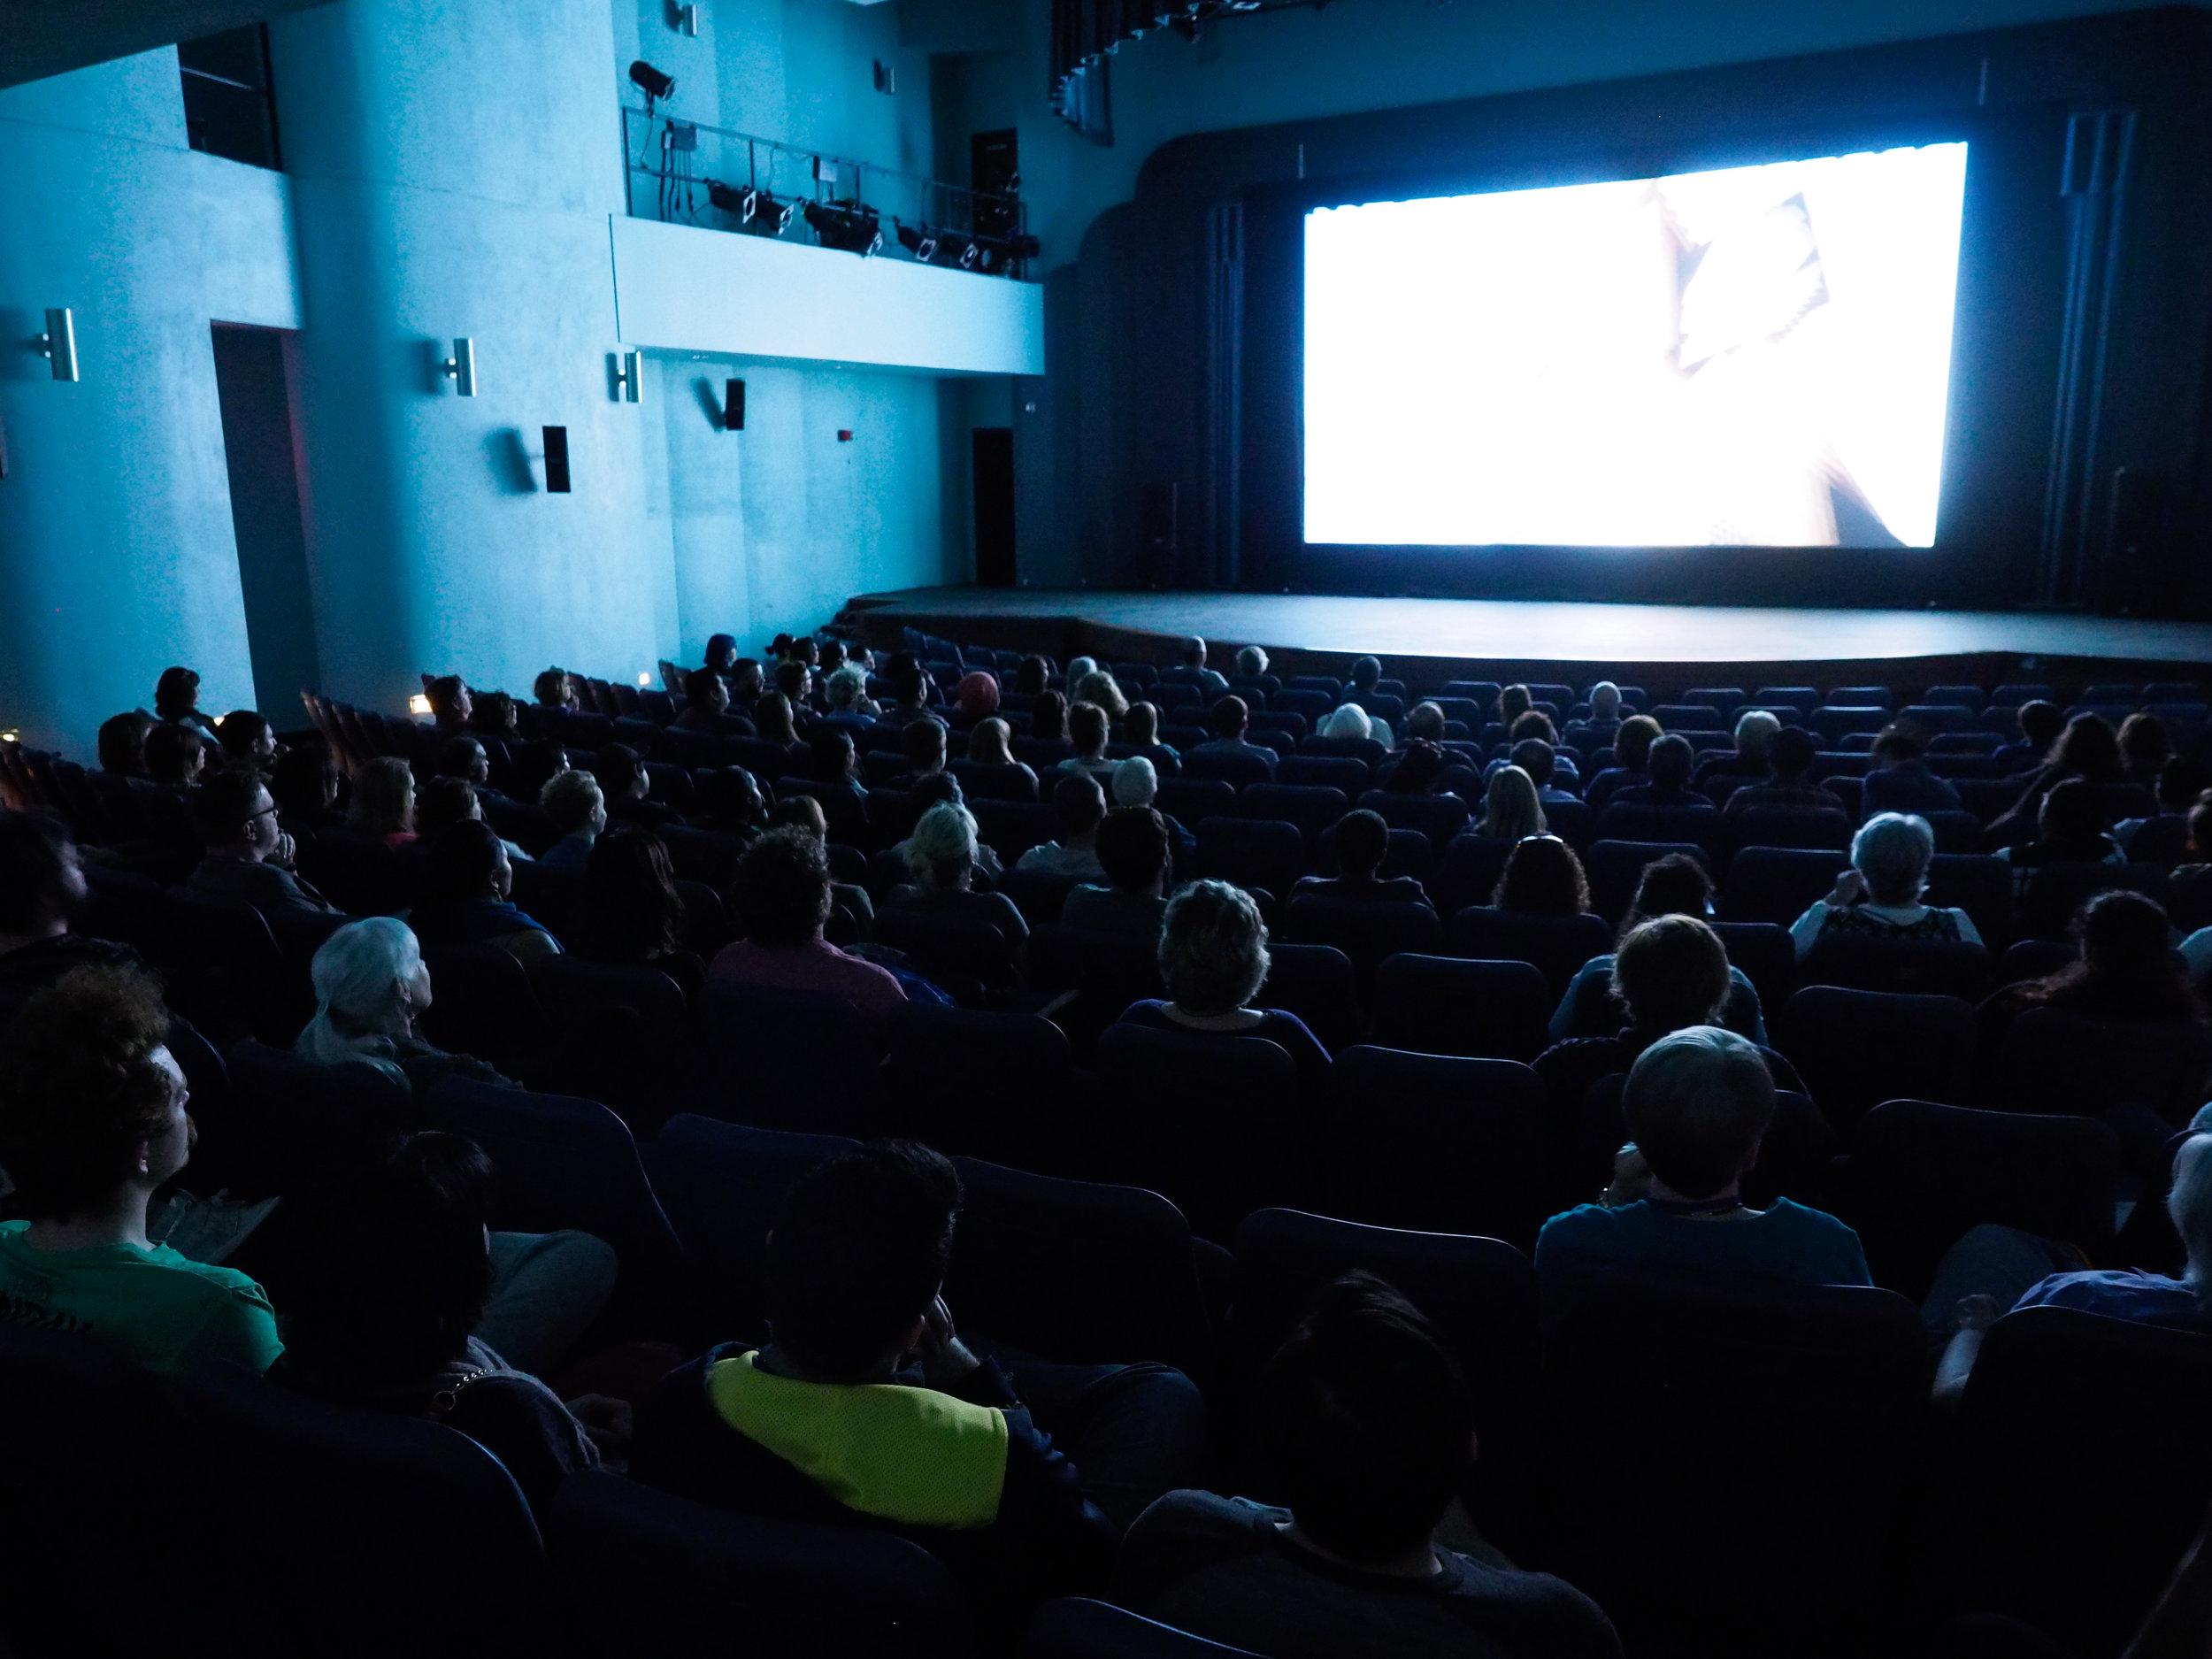 CampusTheater_2-17-2016_Marisol_BarryThornburg-2190104.jpg